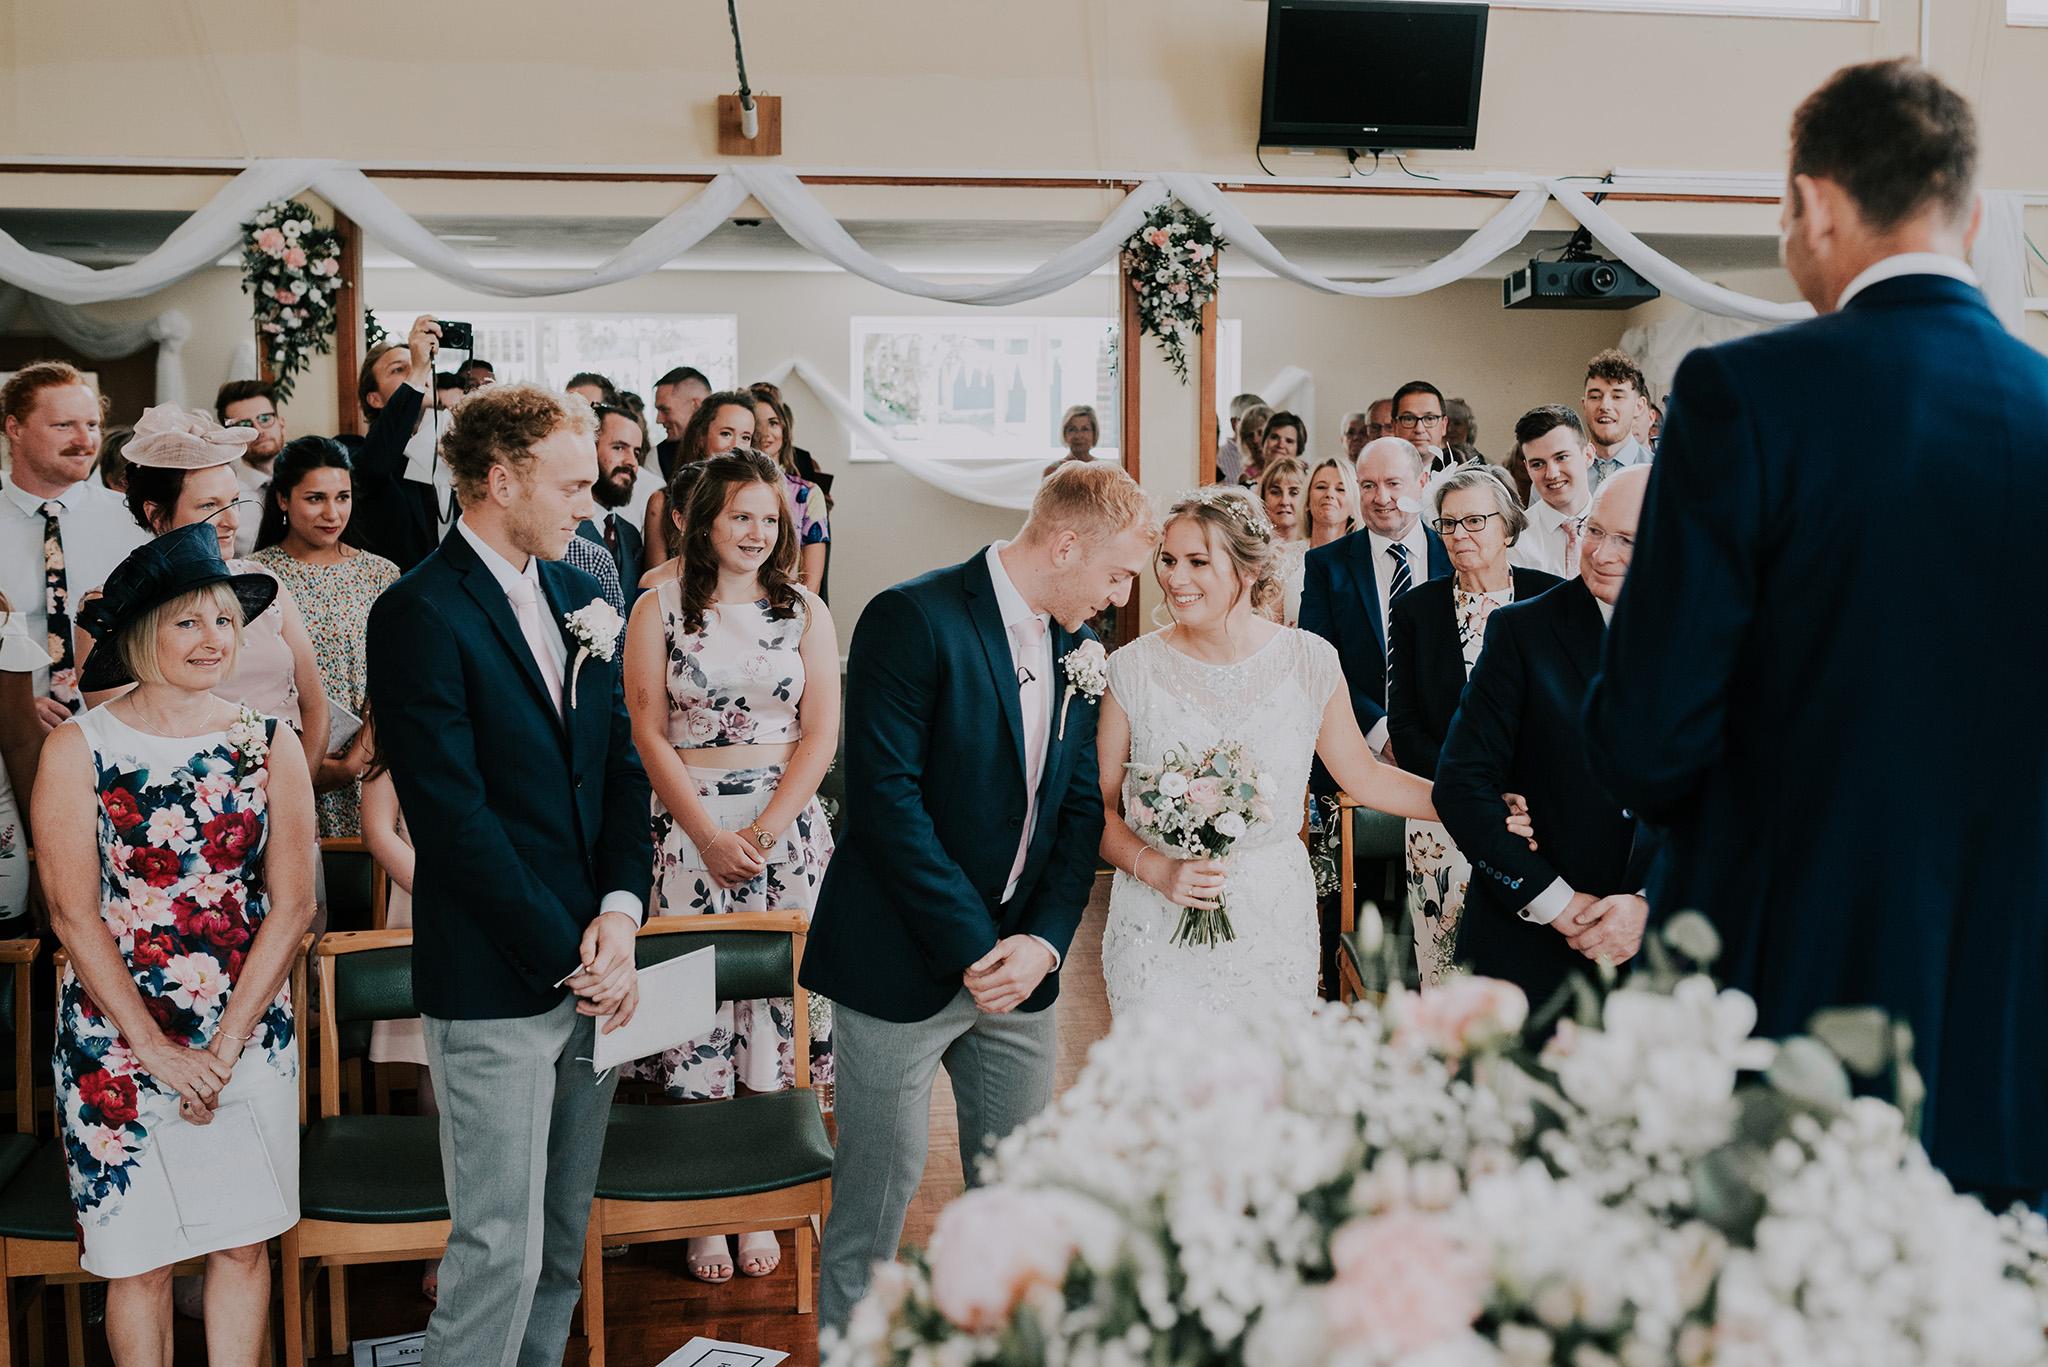 scott-stockwell-photography-wedding-40.jpg